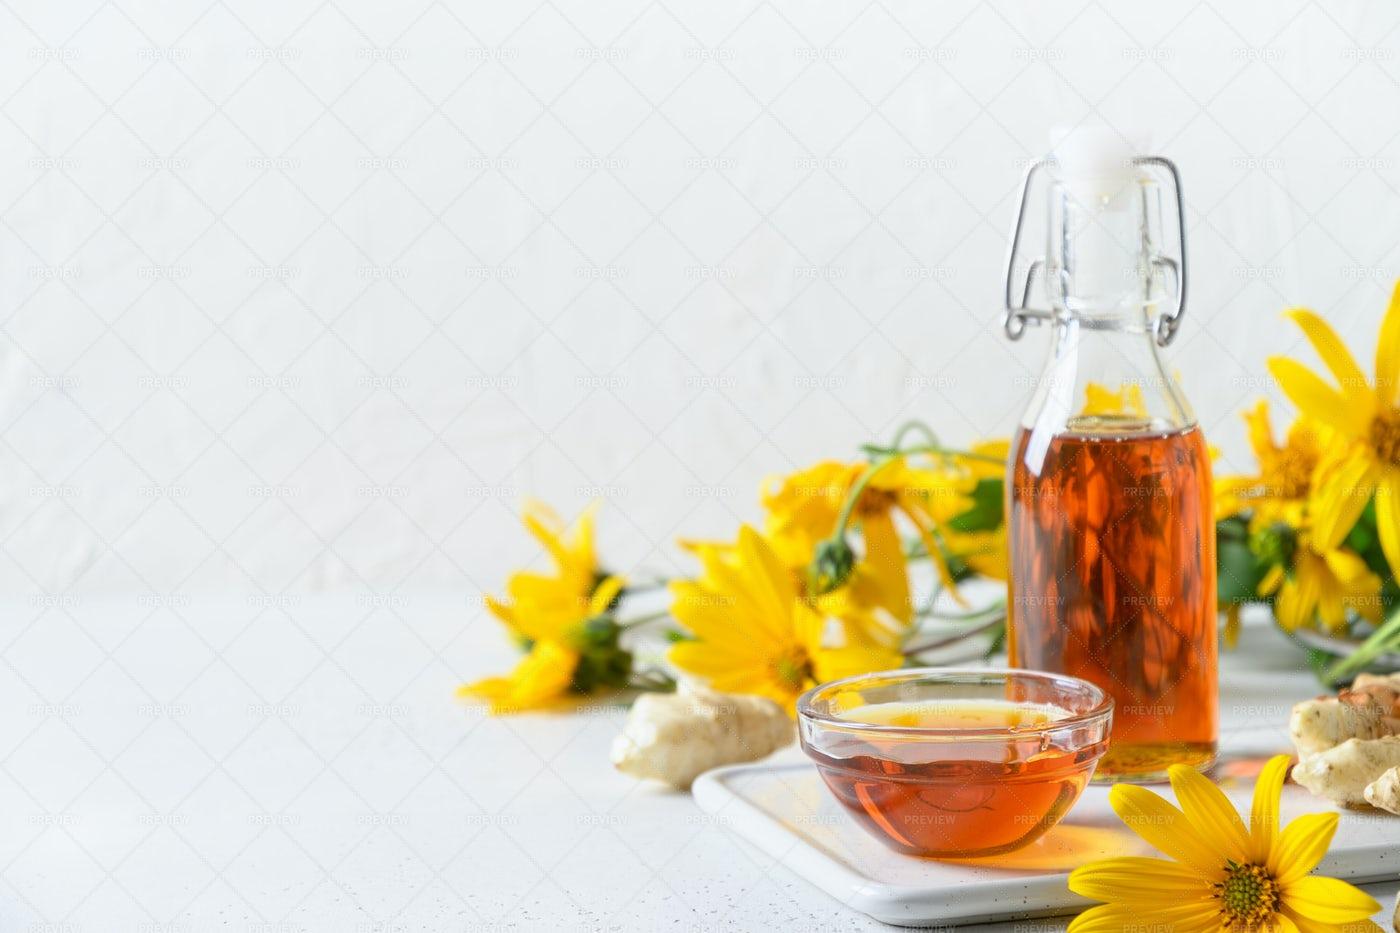 Artichoke Syrup In Bottle: Stock Photos